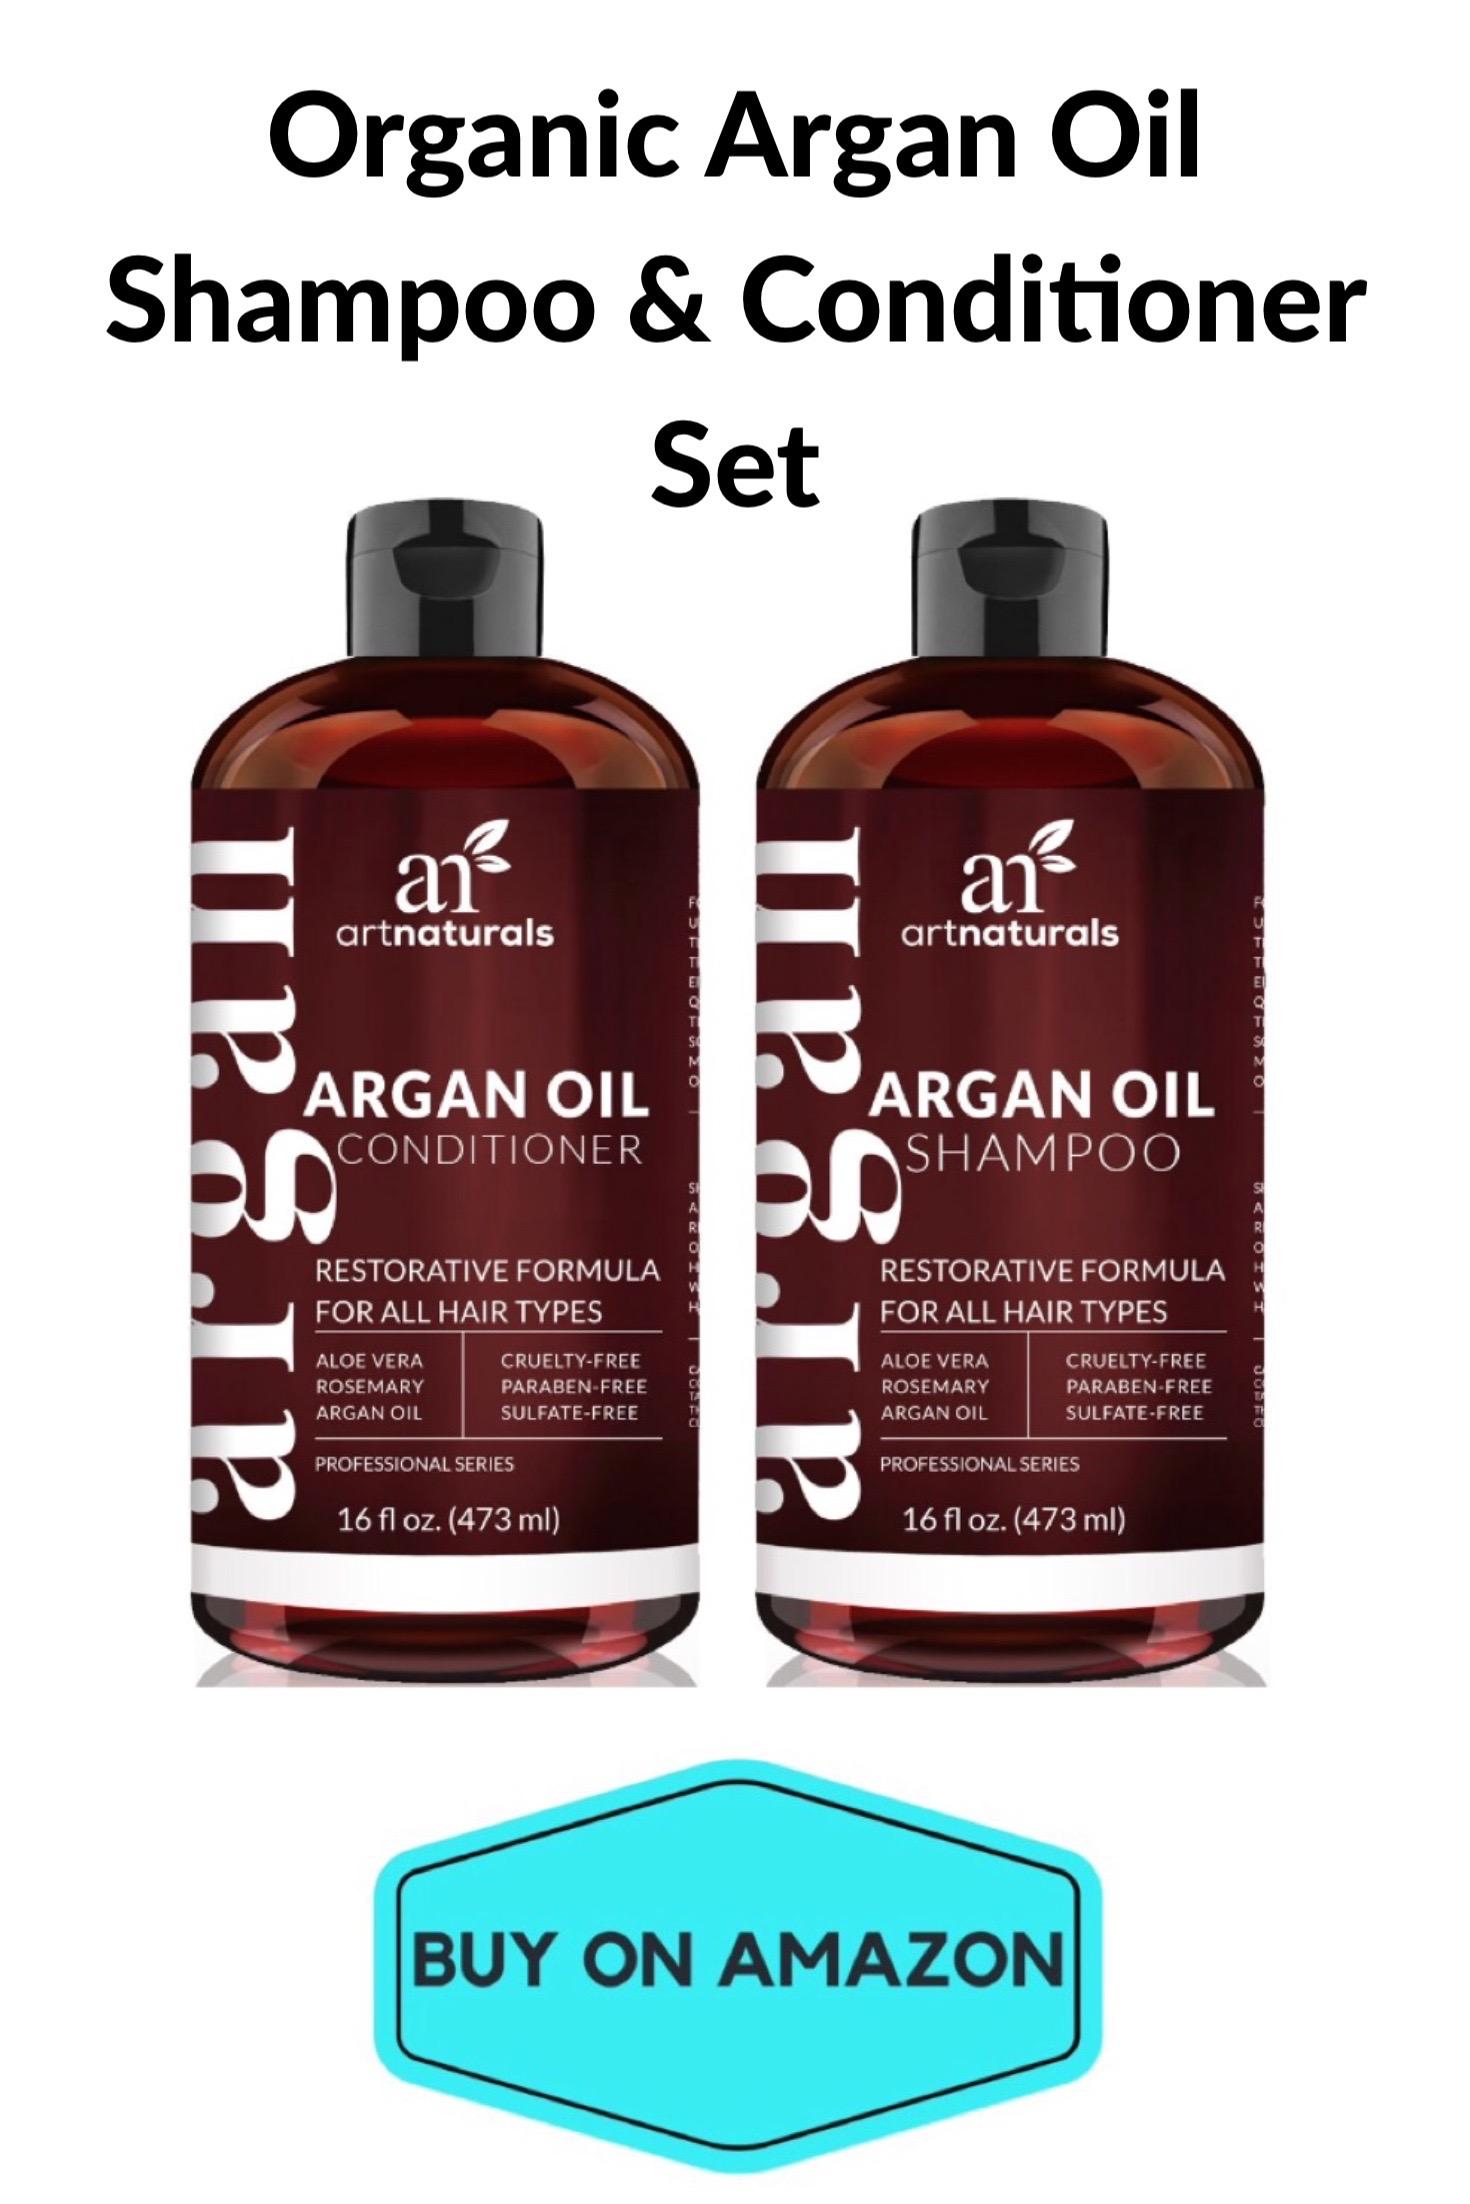 Organic Argan Oil Shampoo & Conditioner